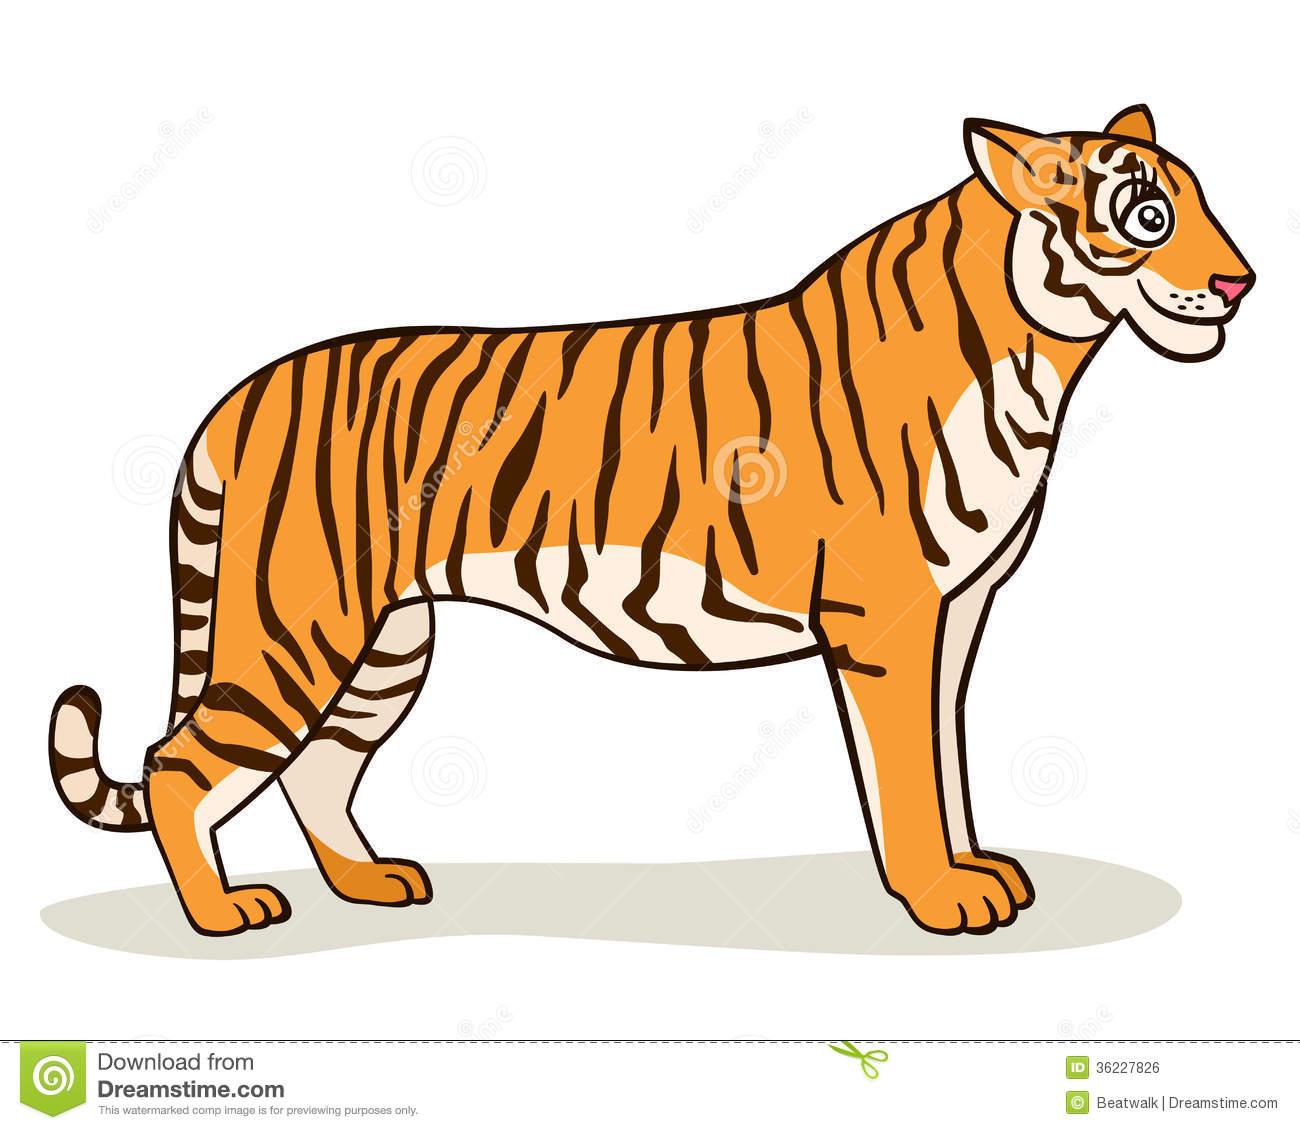 3d Wall Stickers Online Animated Tiger Wallpaper Wallpapersafari